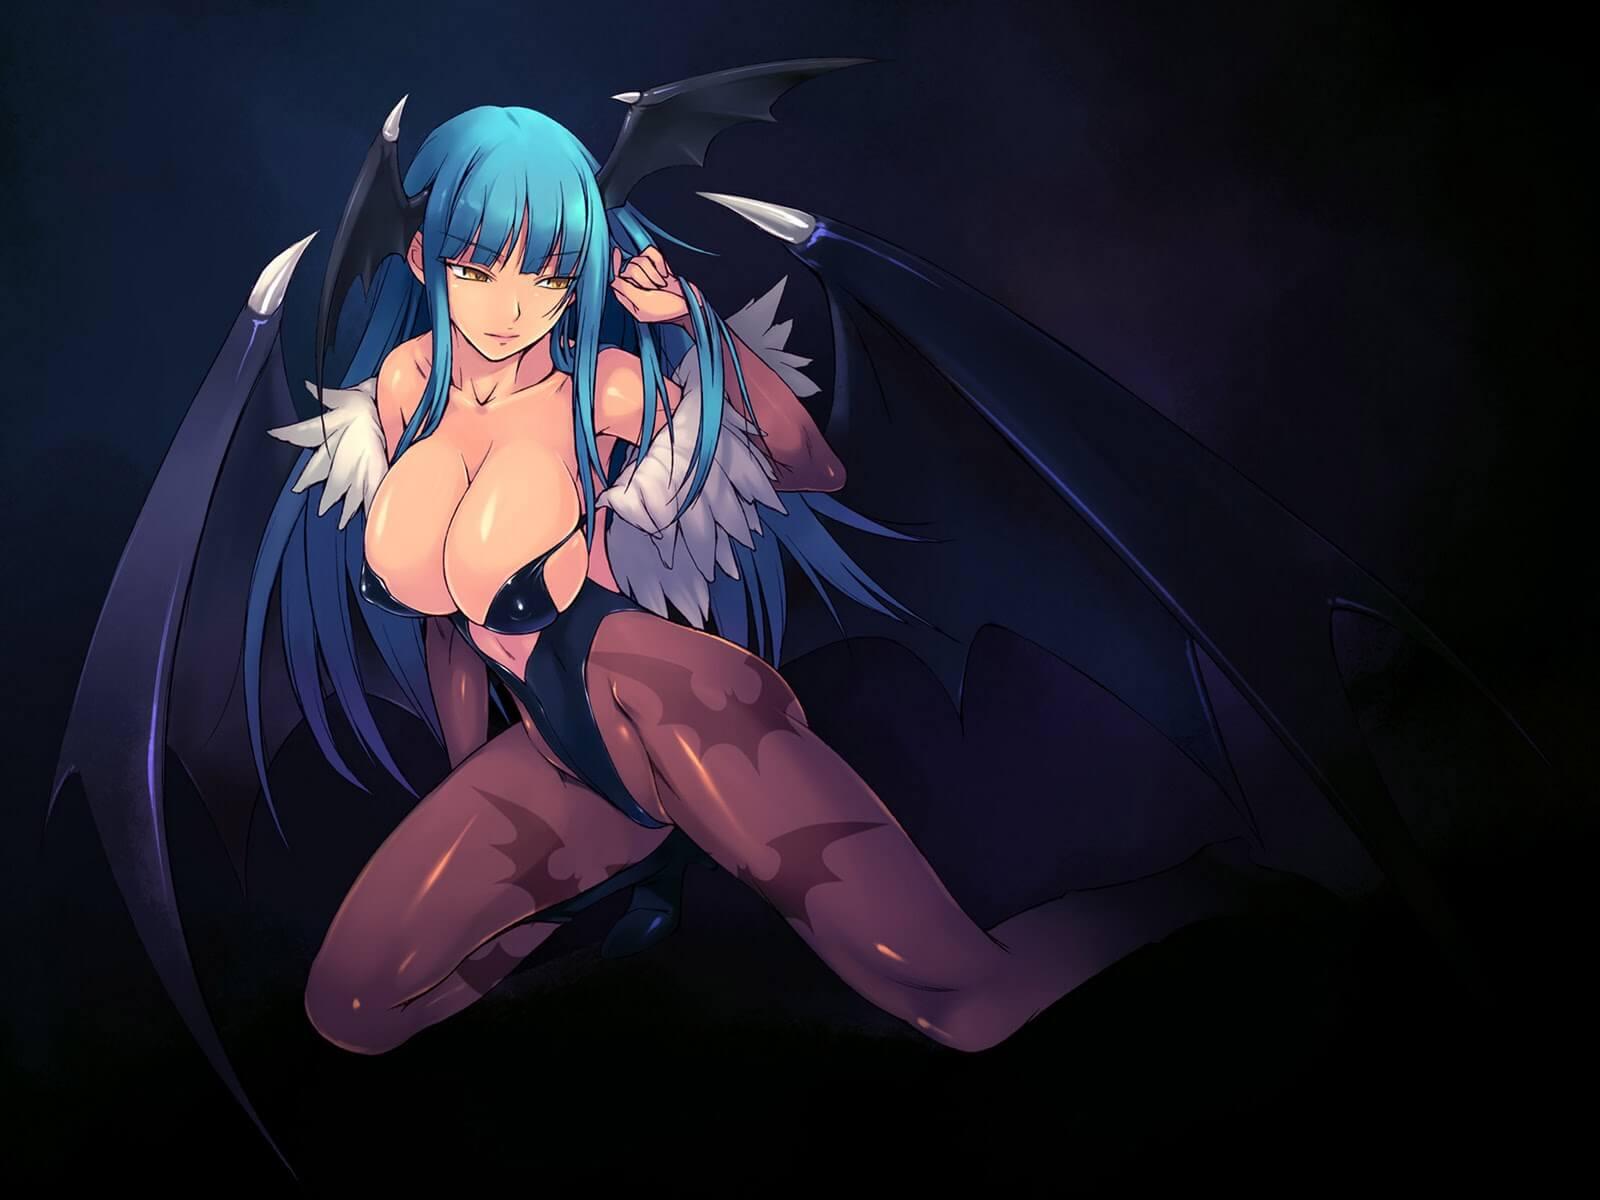 10 Fondos De Pantalla Sexys De Chicas Anime Nosoynoob